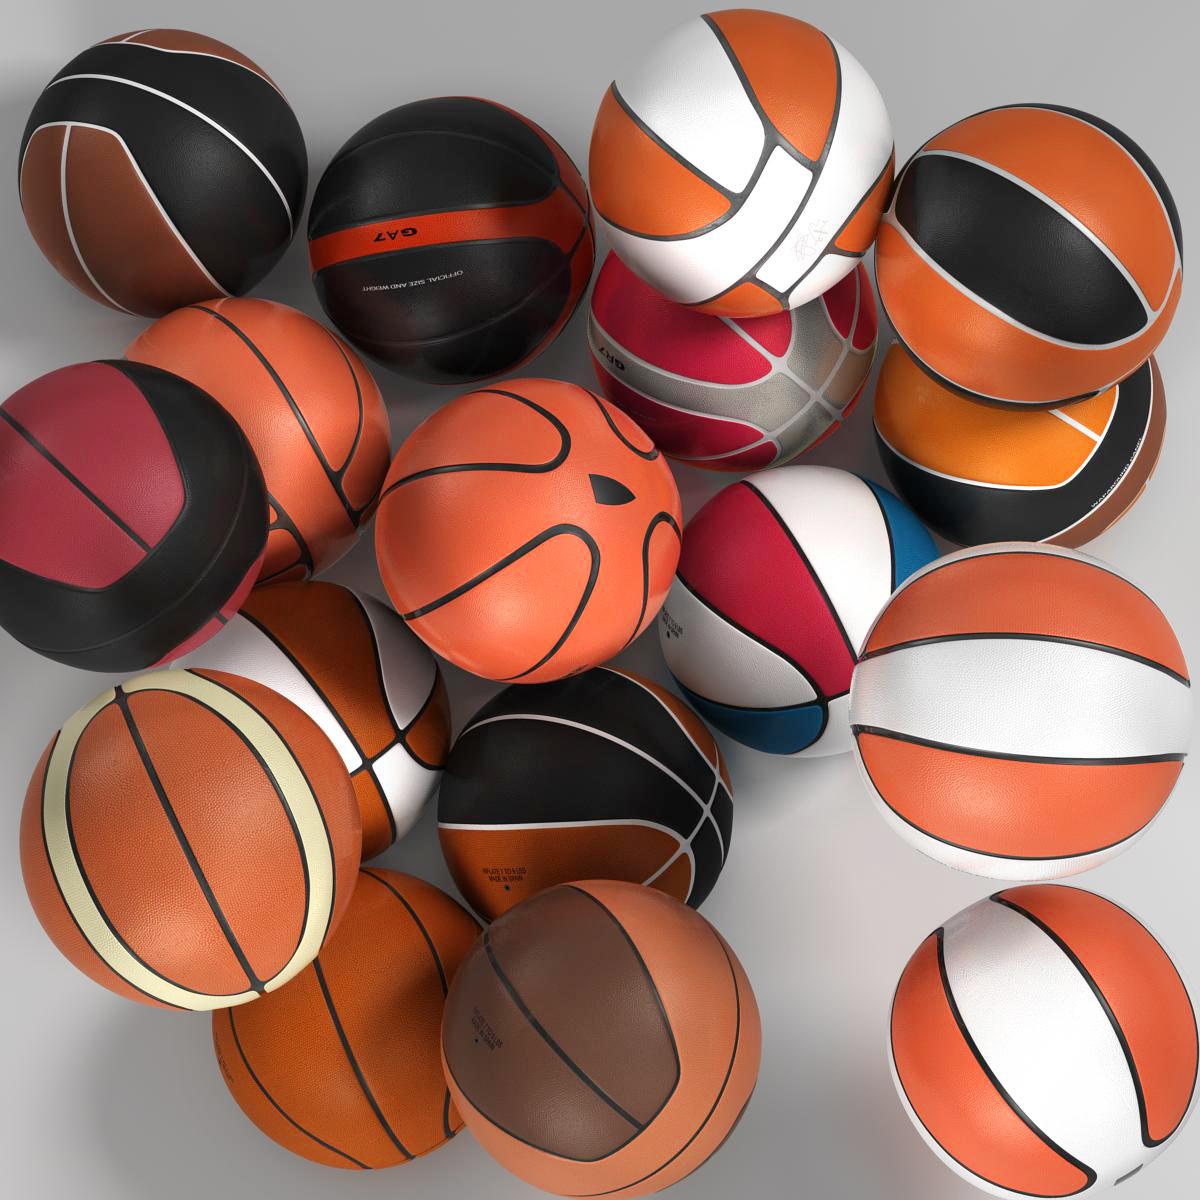 basketbola bumbu komplekts 3d modelis 3ds max fbx c4d ma mb obj 165931